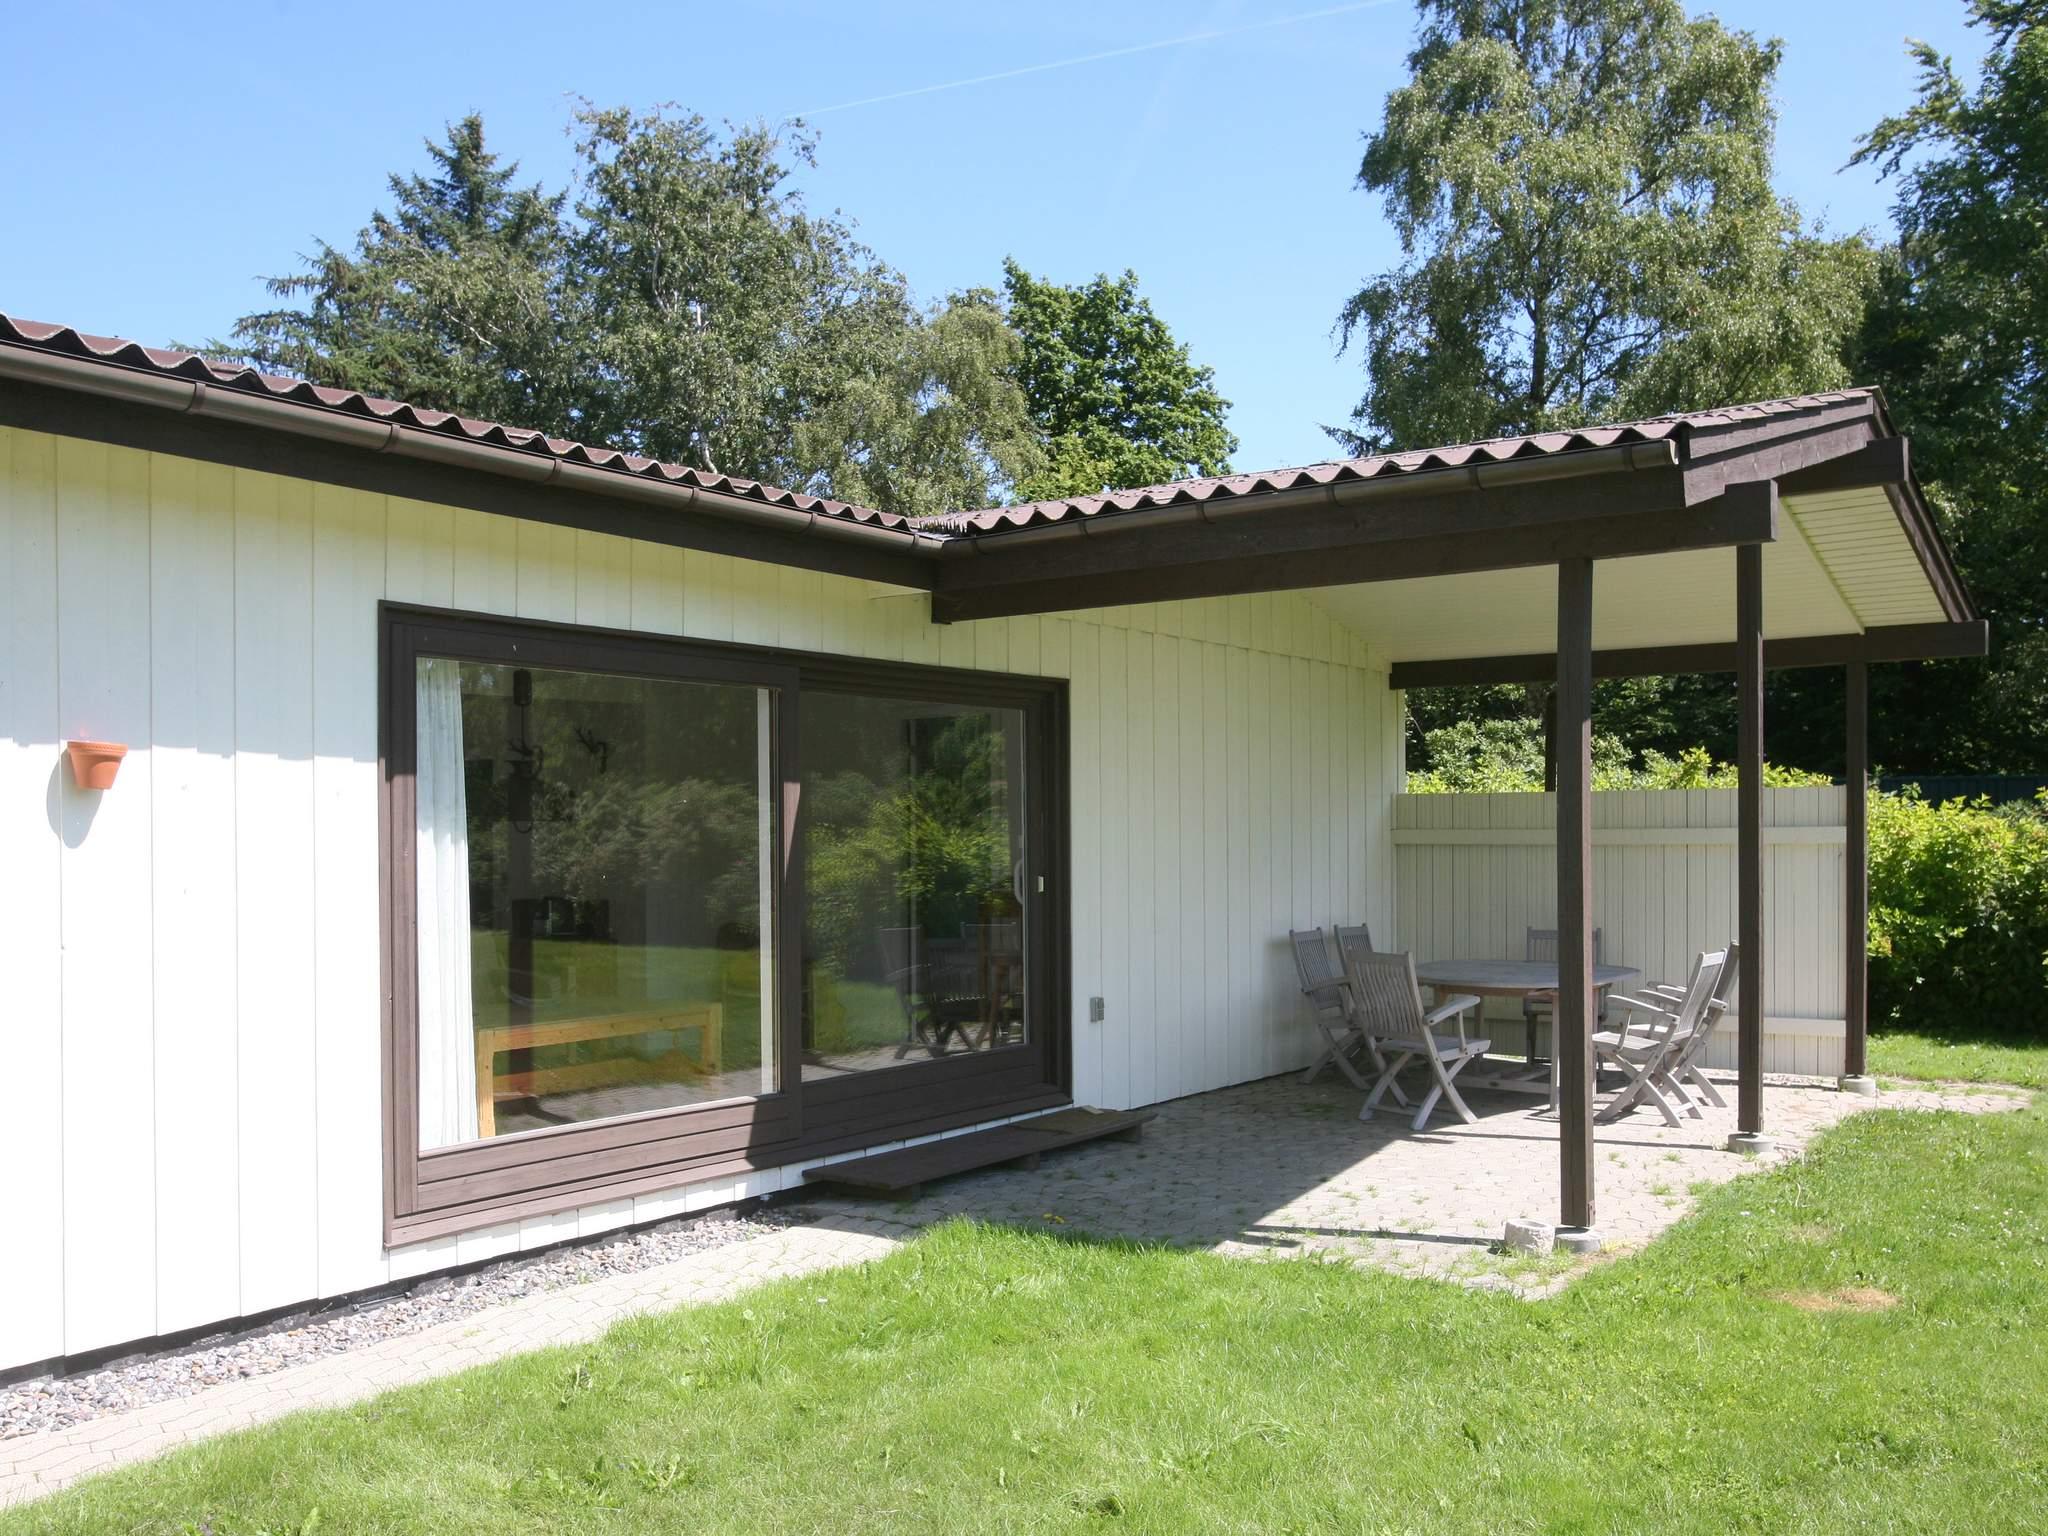 Ferienhaus Faxe Ladeplads (251691), Fakse Ladeplads, , Südseeland, Dänemark, Bild 9